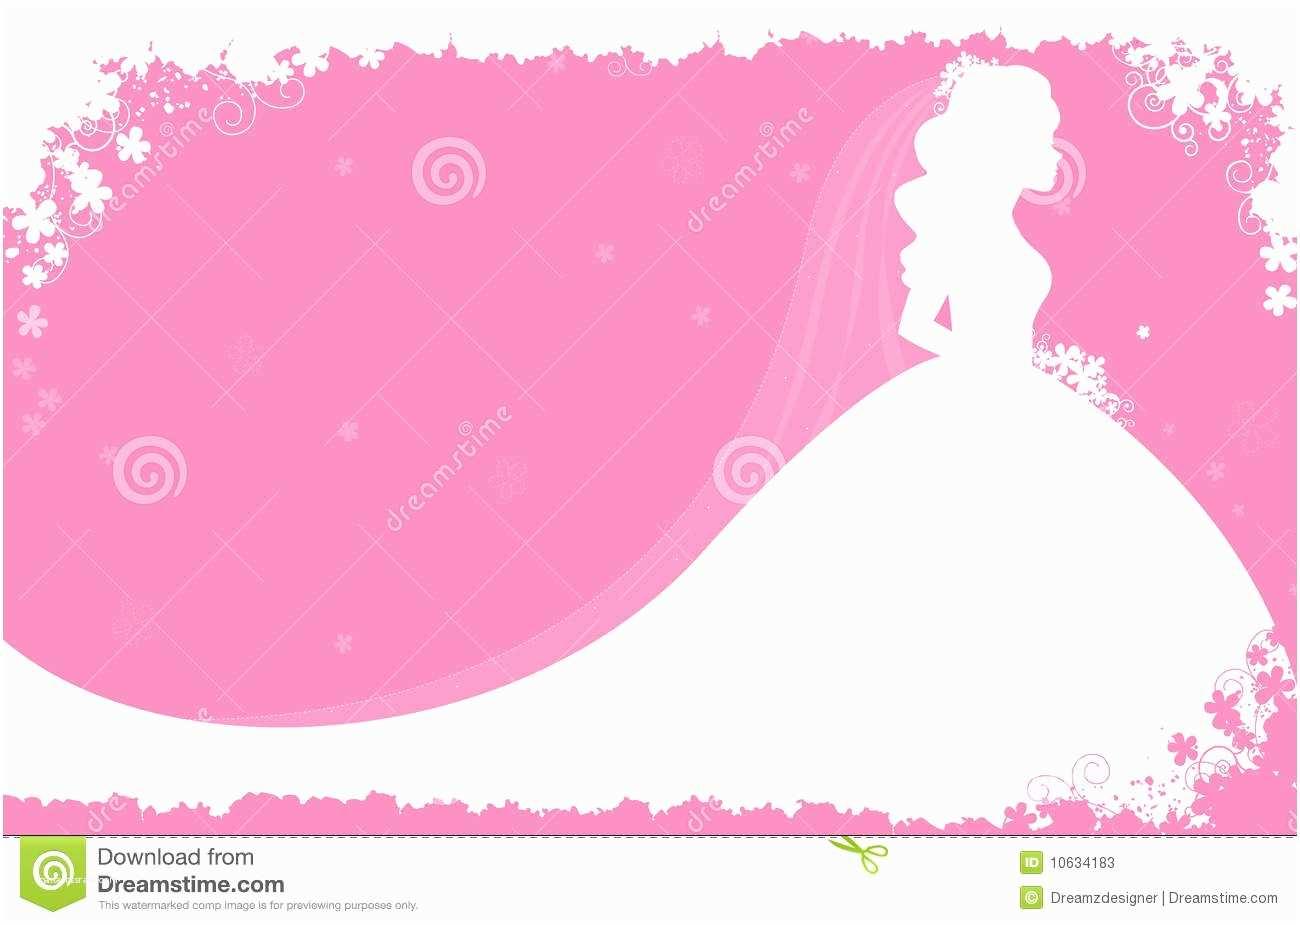 Bridal Shower Invitation Templates Clipart for Bridal Shower Invitations – 101 Clip Art